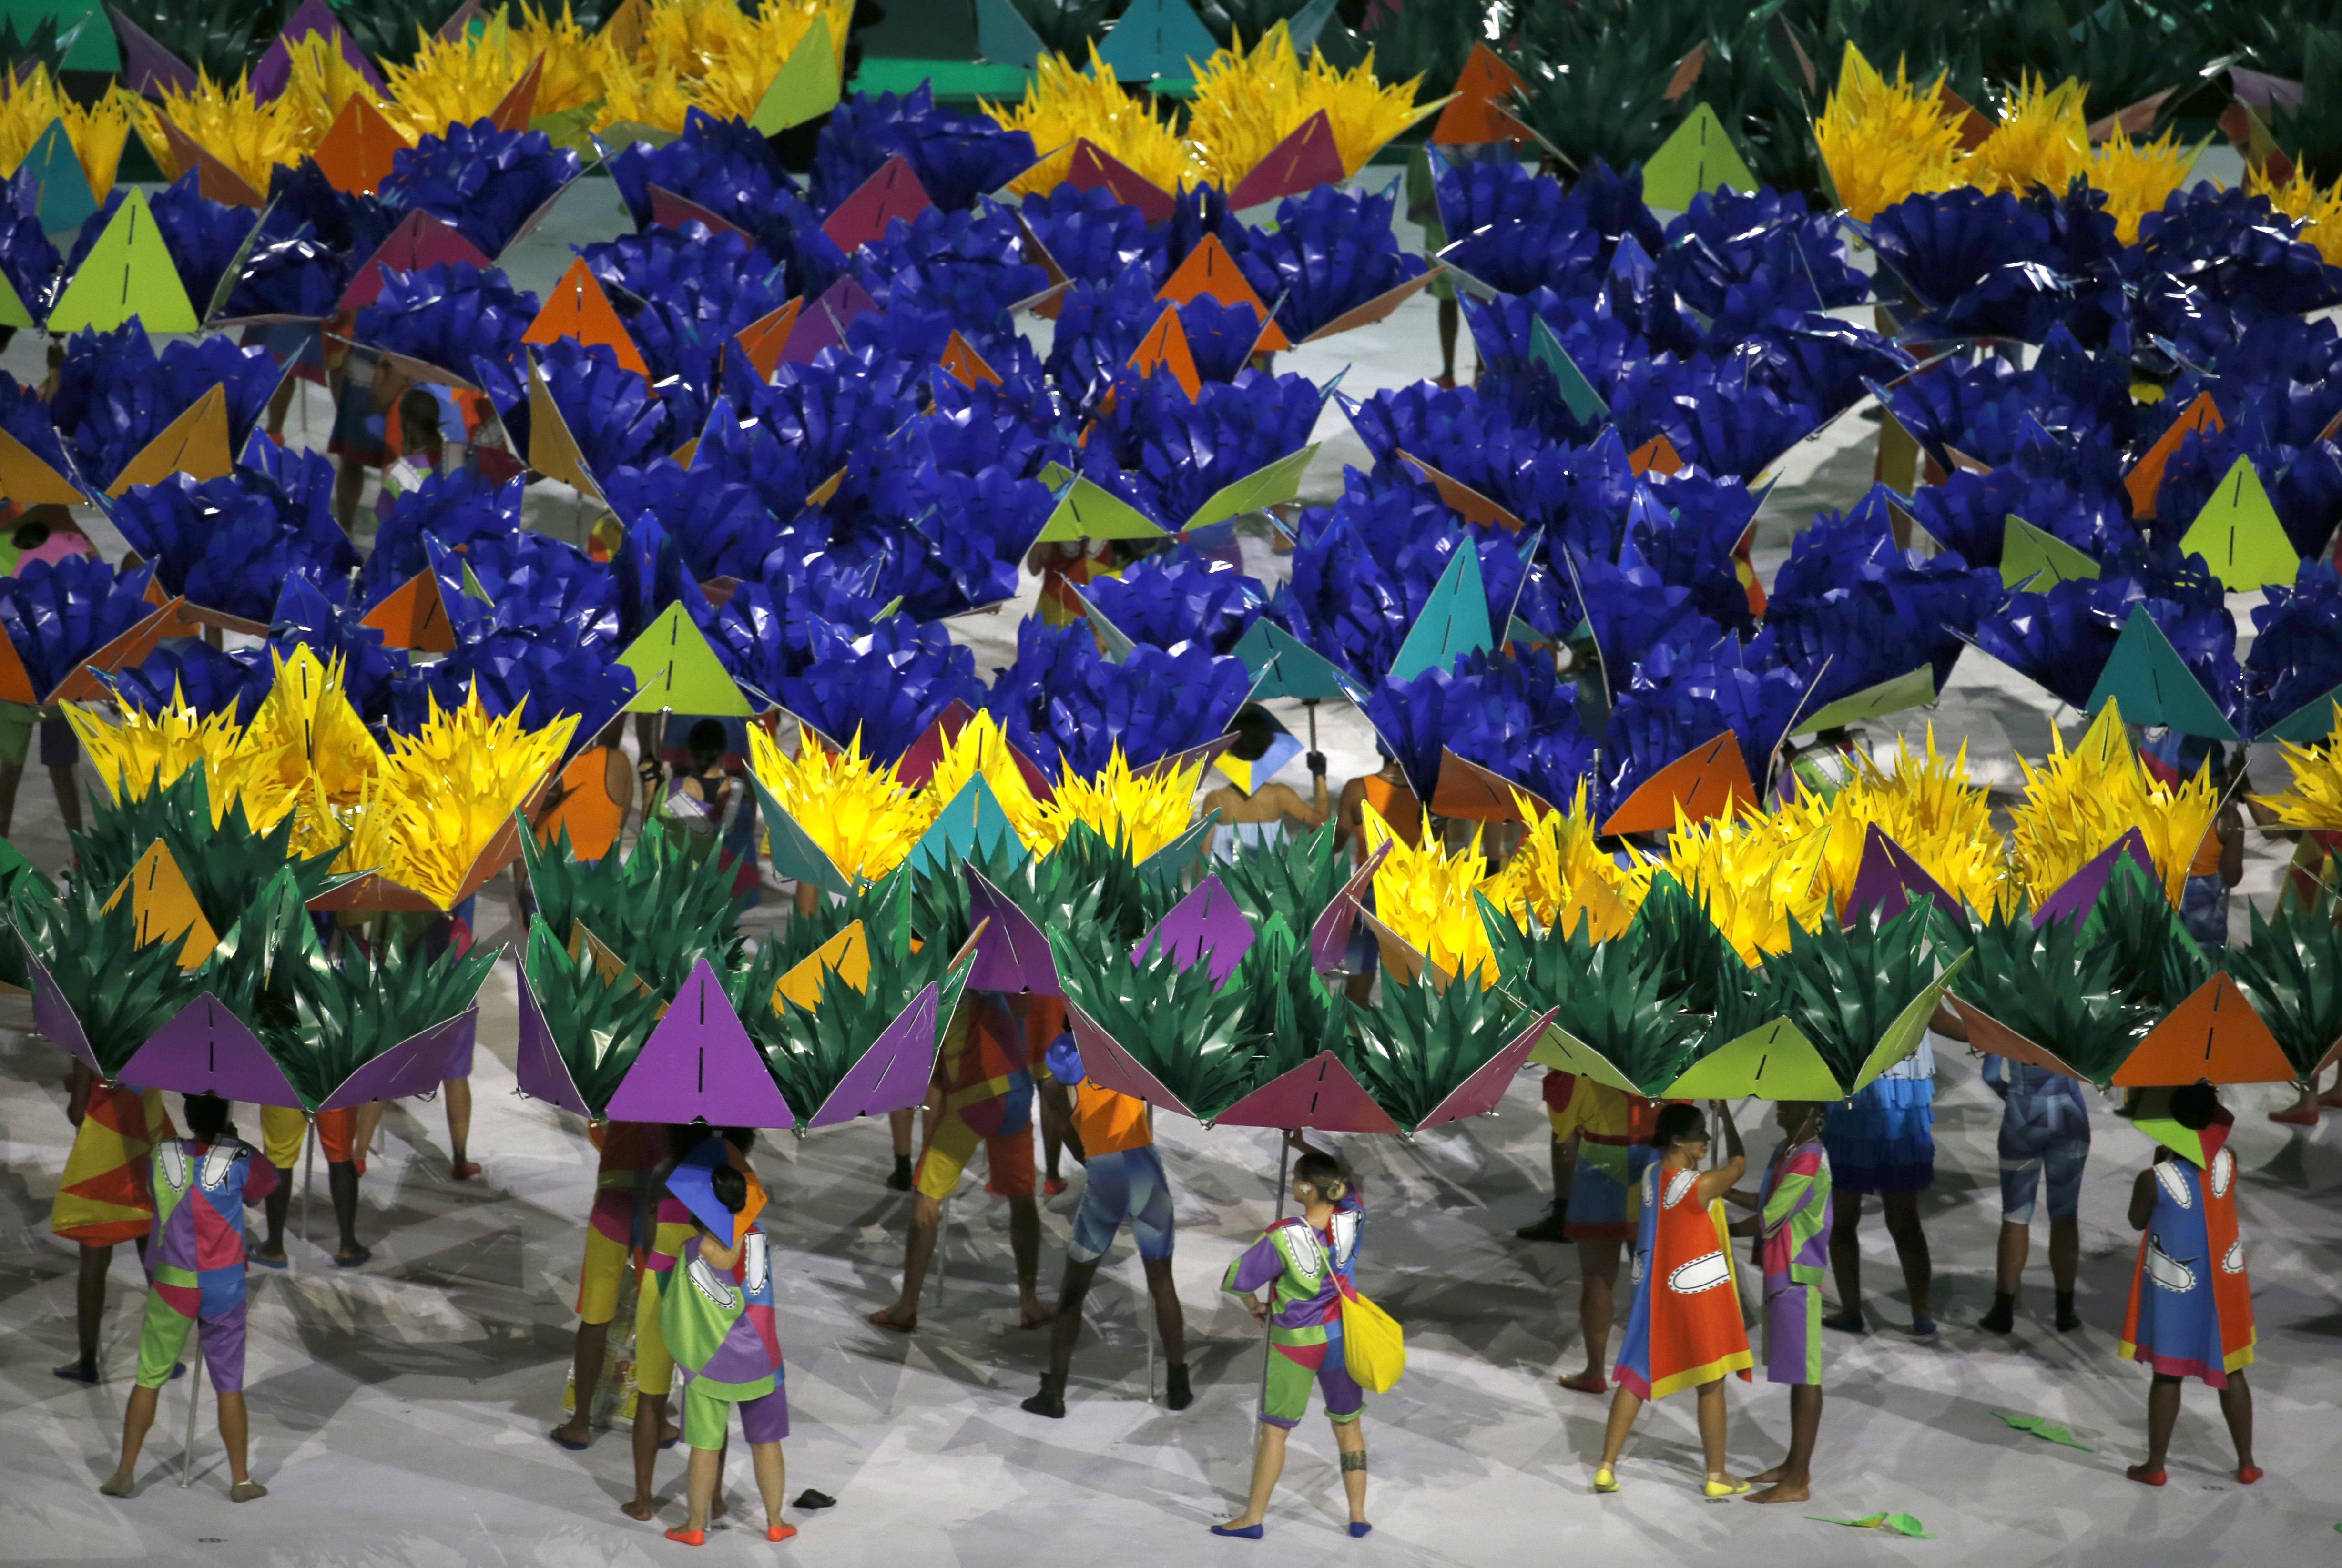 Dancers perform during the opening ceremony of the Rio 2016 Paralympic games at Maracana Stadium in Rio de Janeiro, Brazil, Sept. 7, 2016. (AP Photo/Silvia Izquierdo)